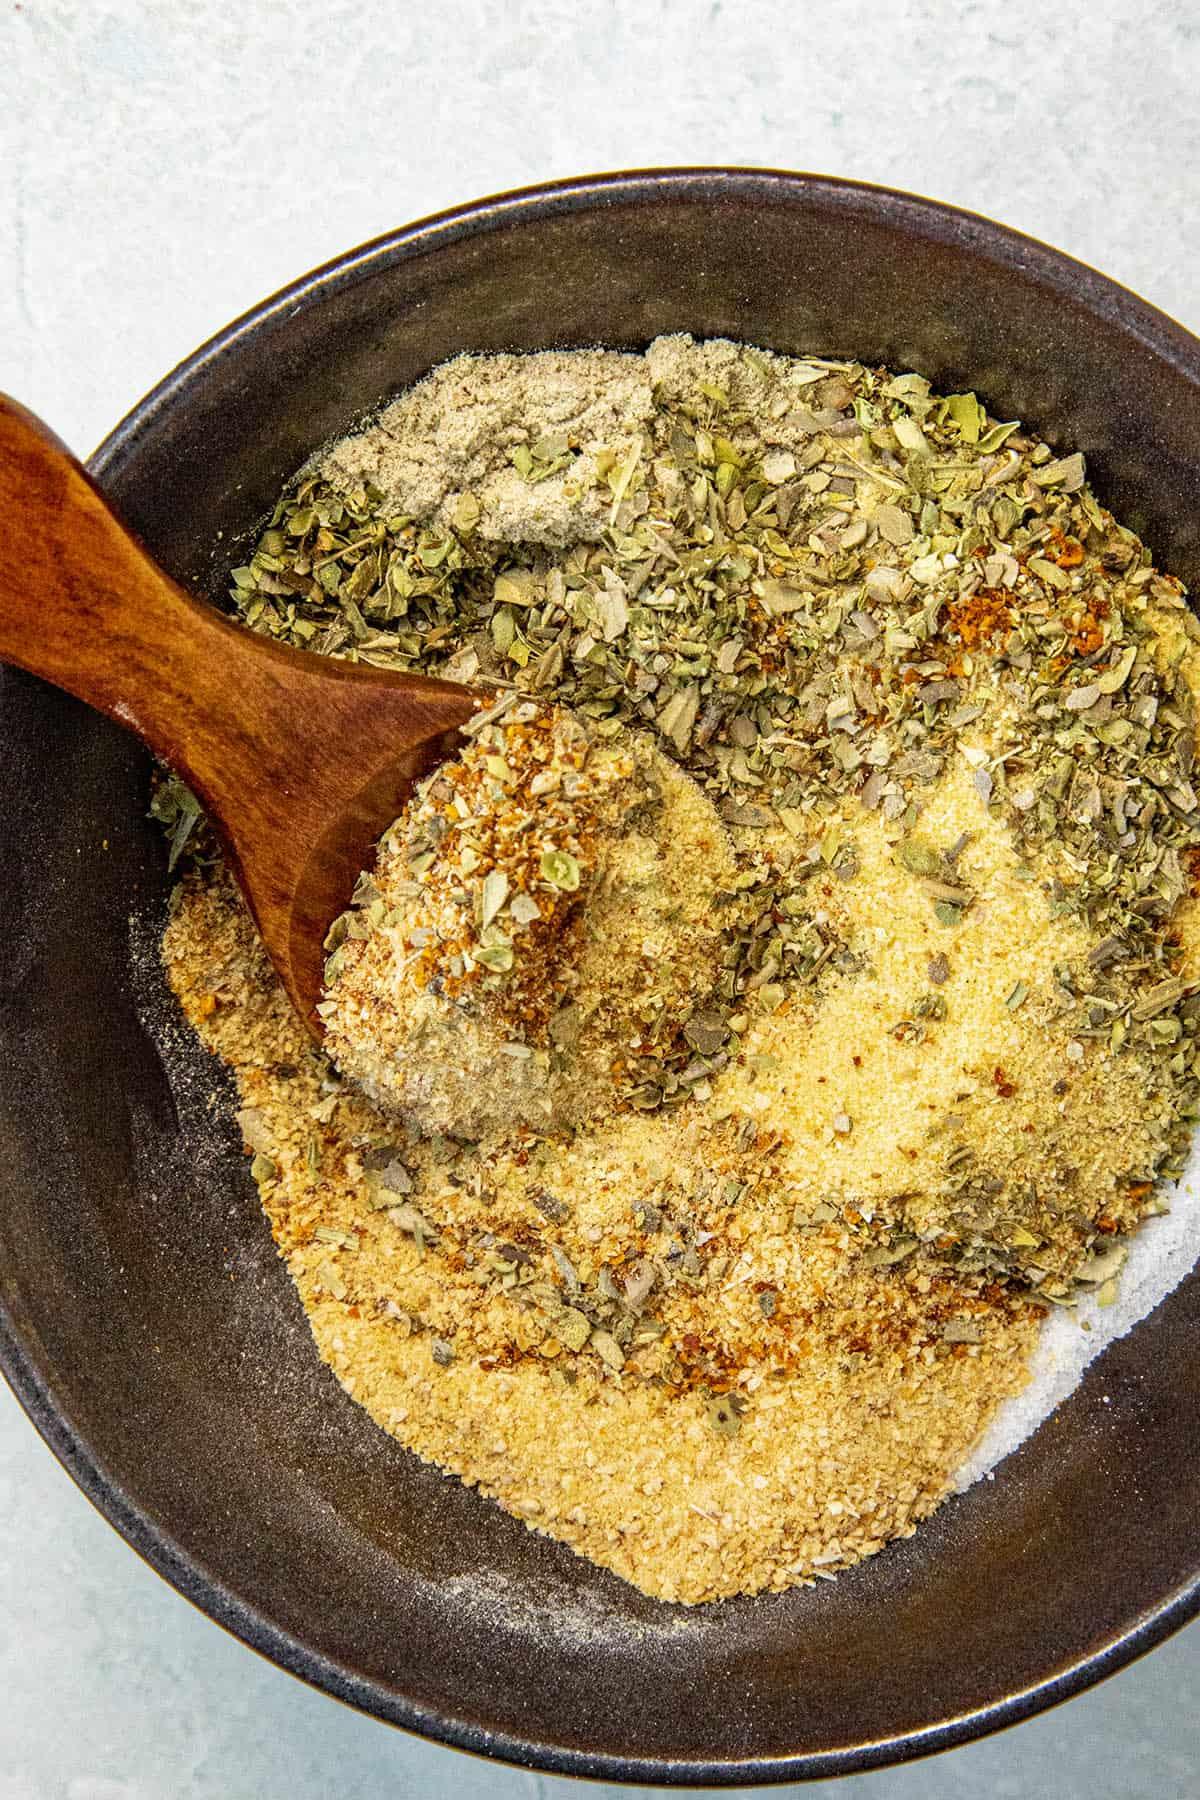 Adobo Seasoning ingredients being mixed in a bowl